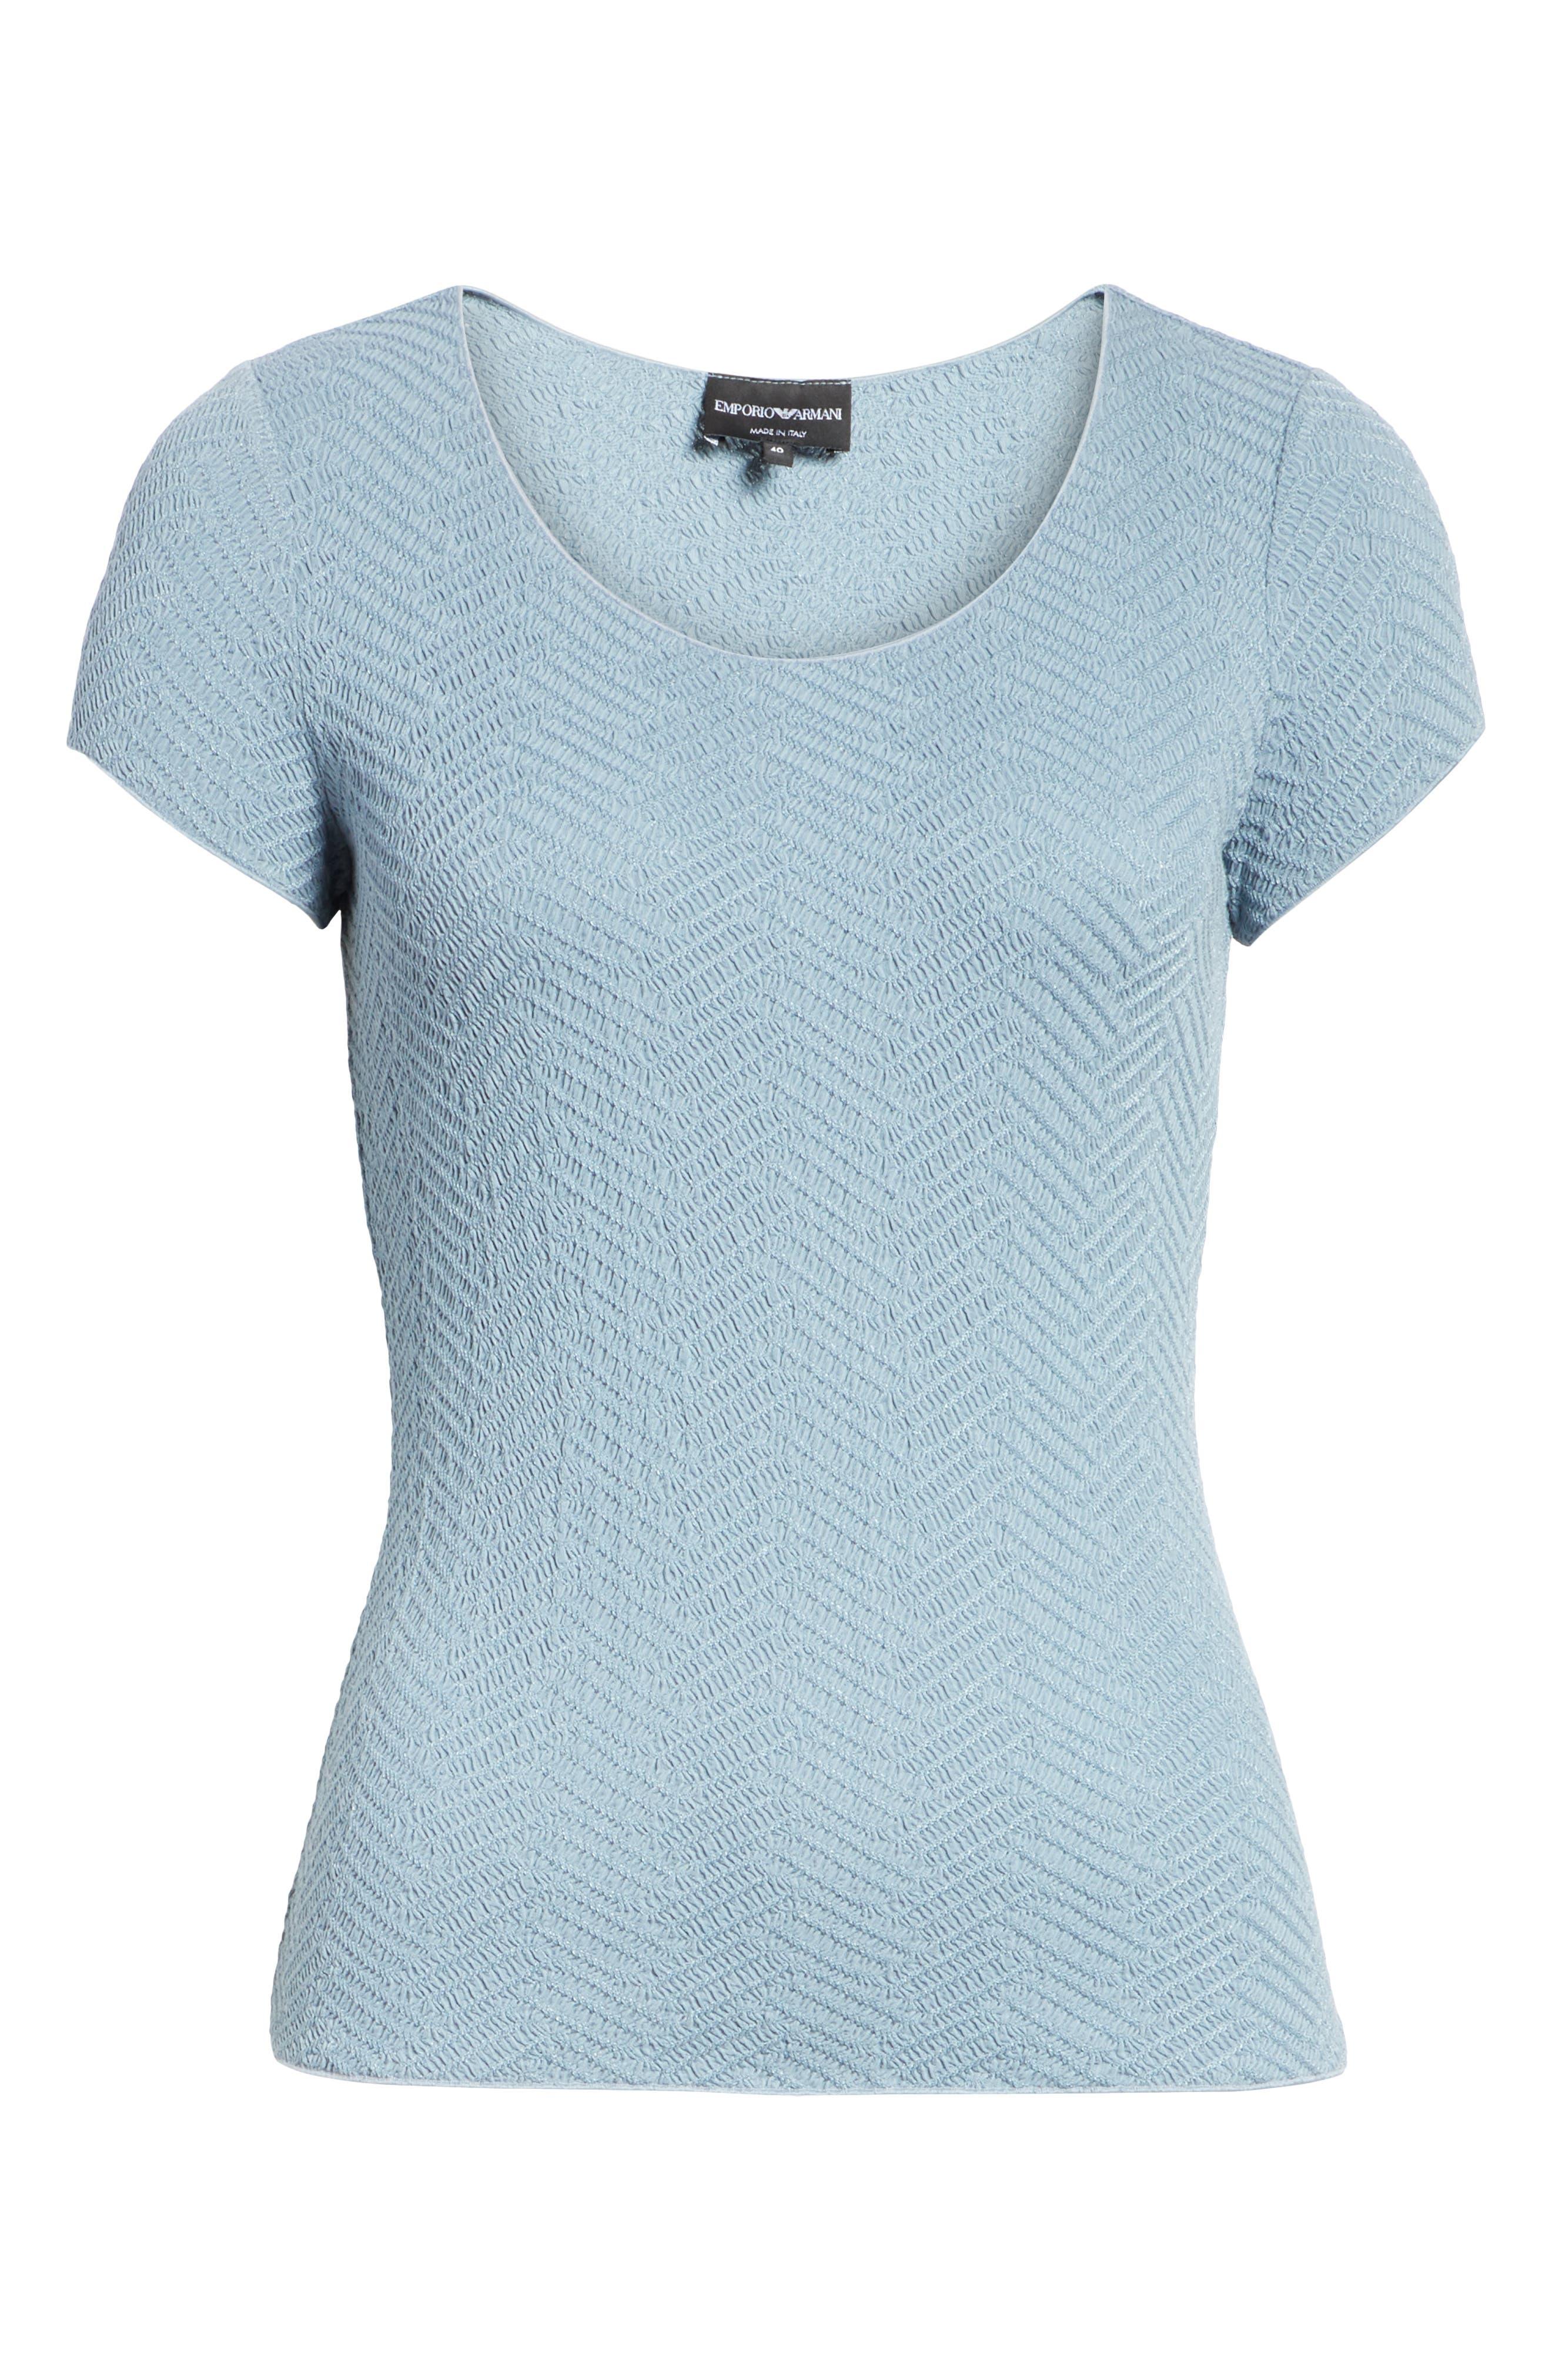 Short Sleeve Jersey Tee,                             Alternate thumbnail 6, color,                             STONE BLUE